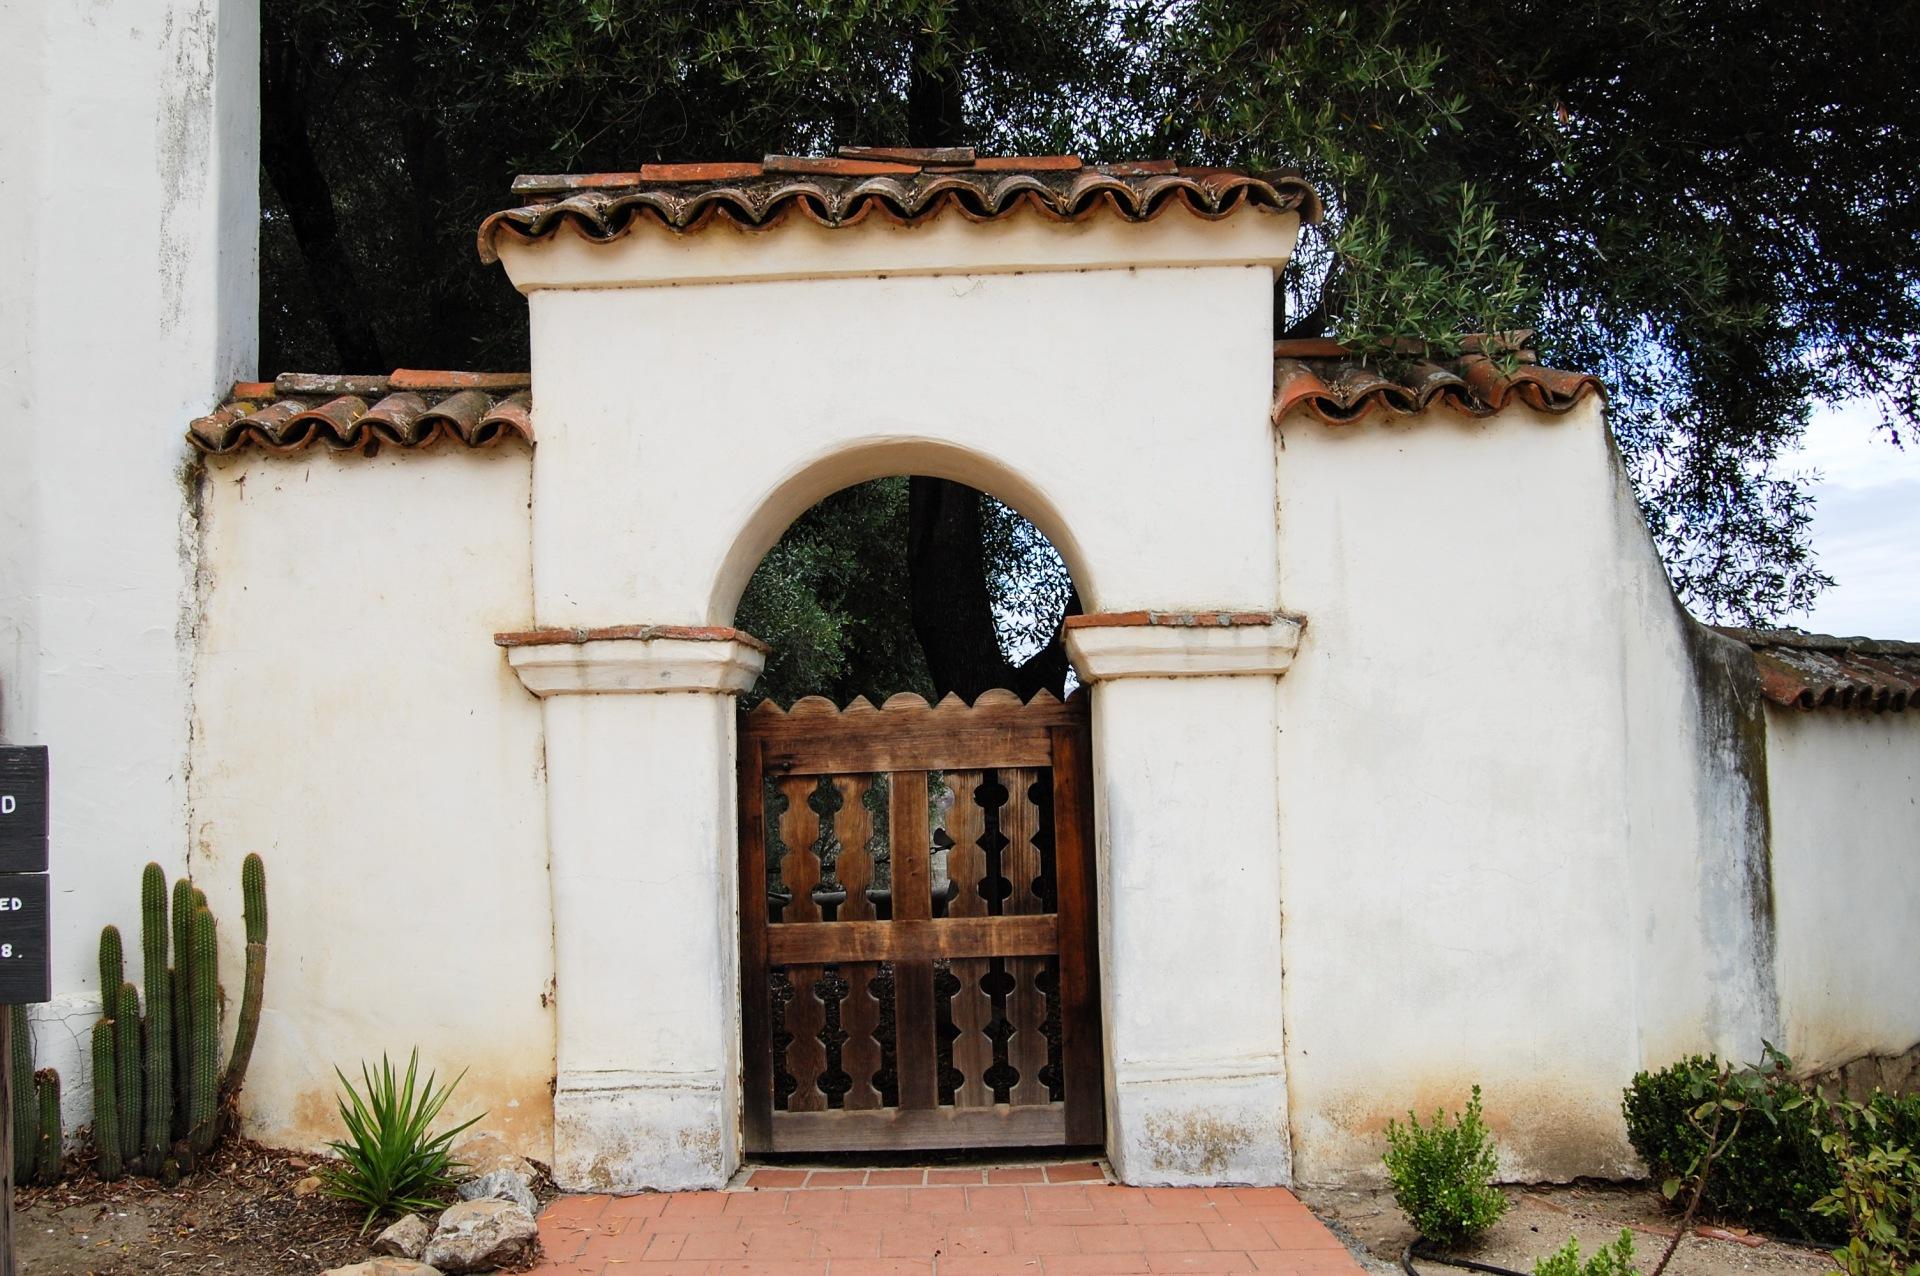 san-juan-bautista-gate-to-cemetary